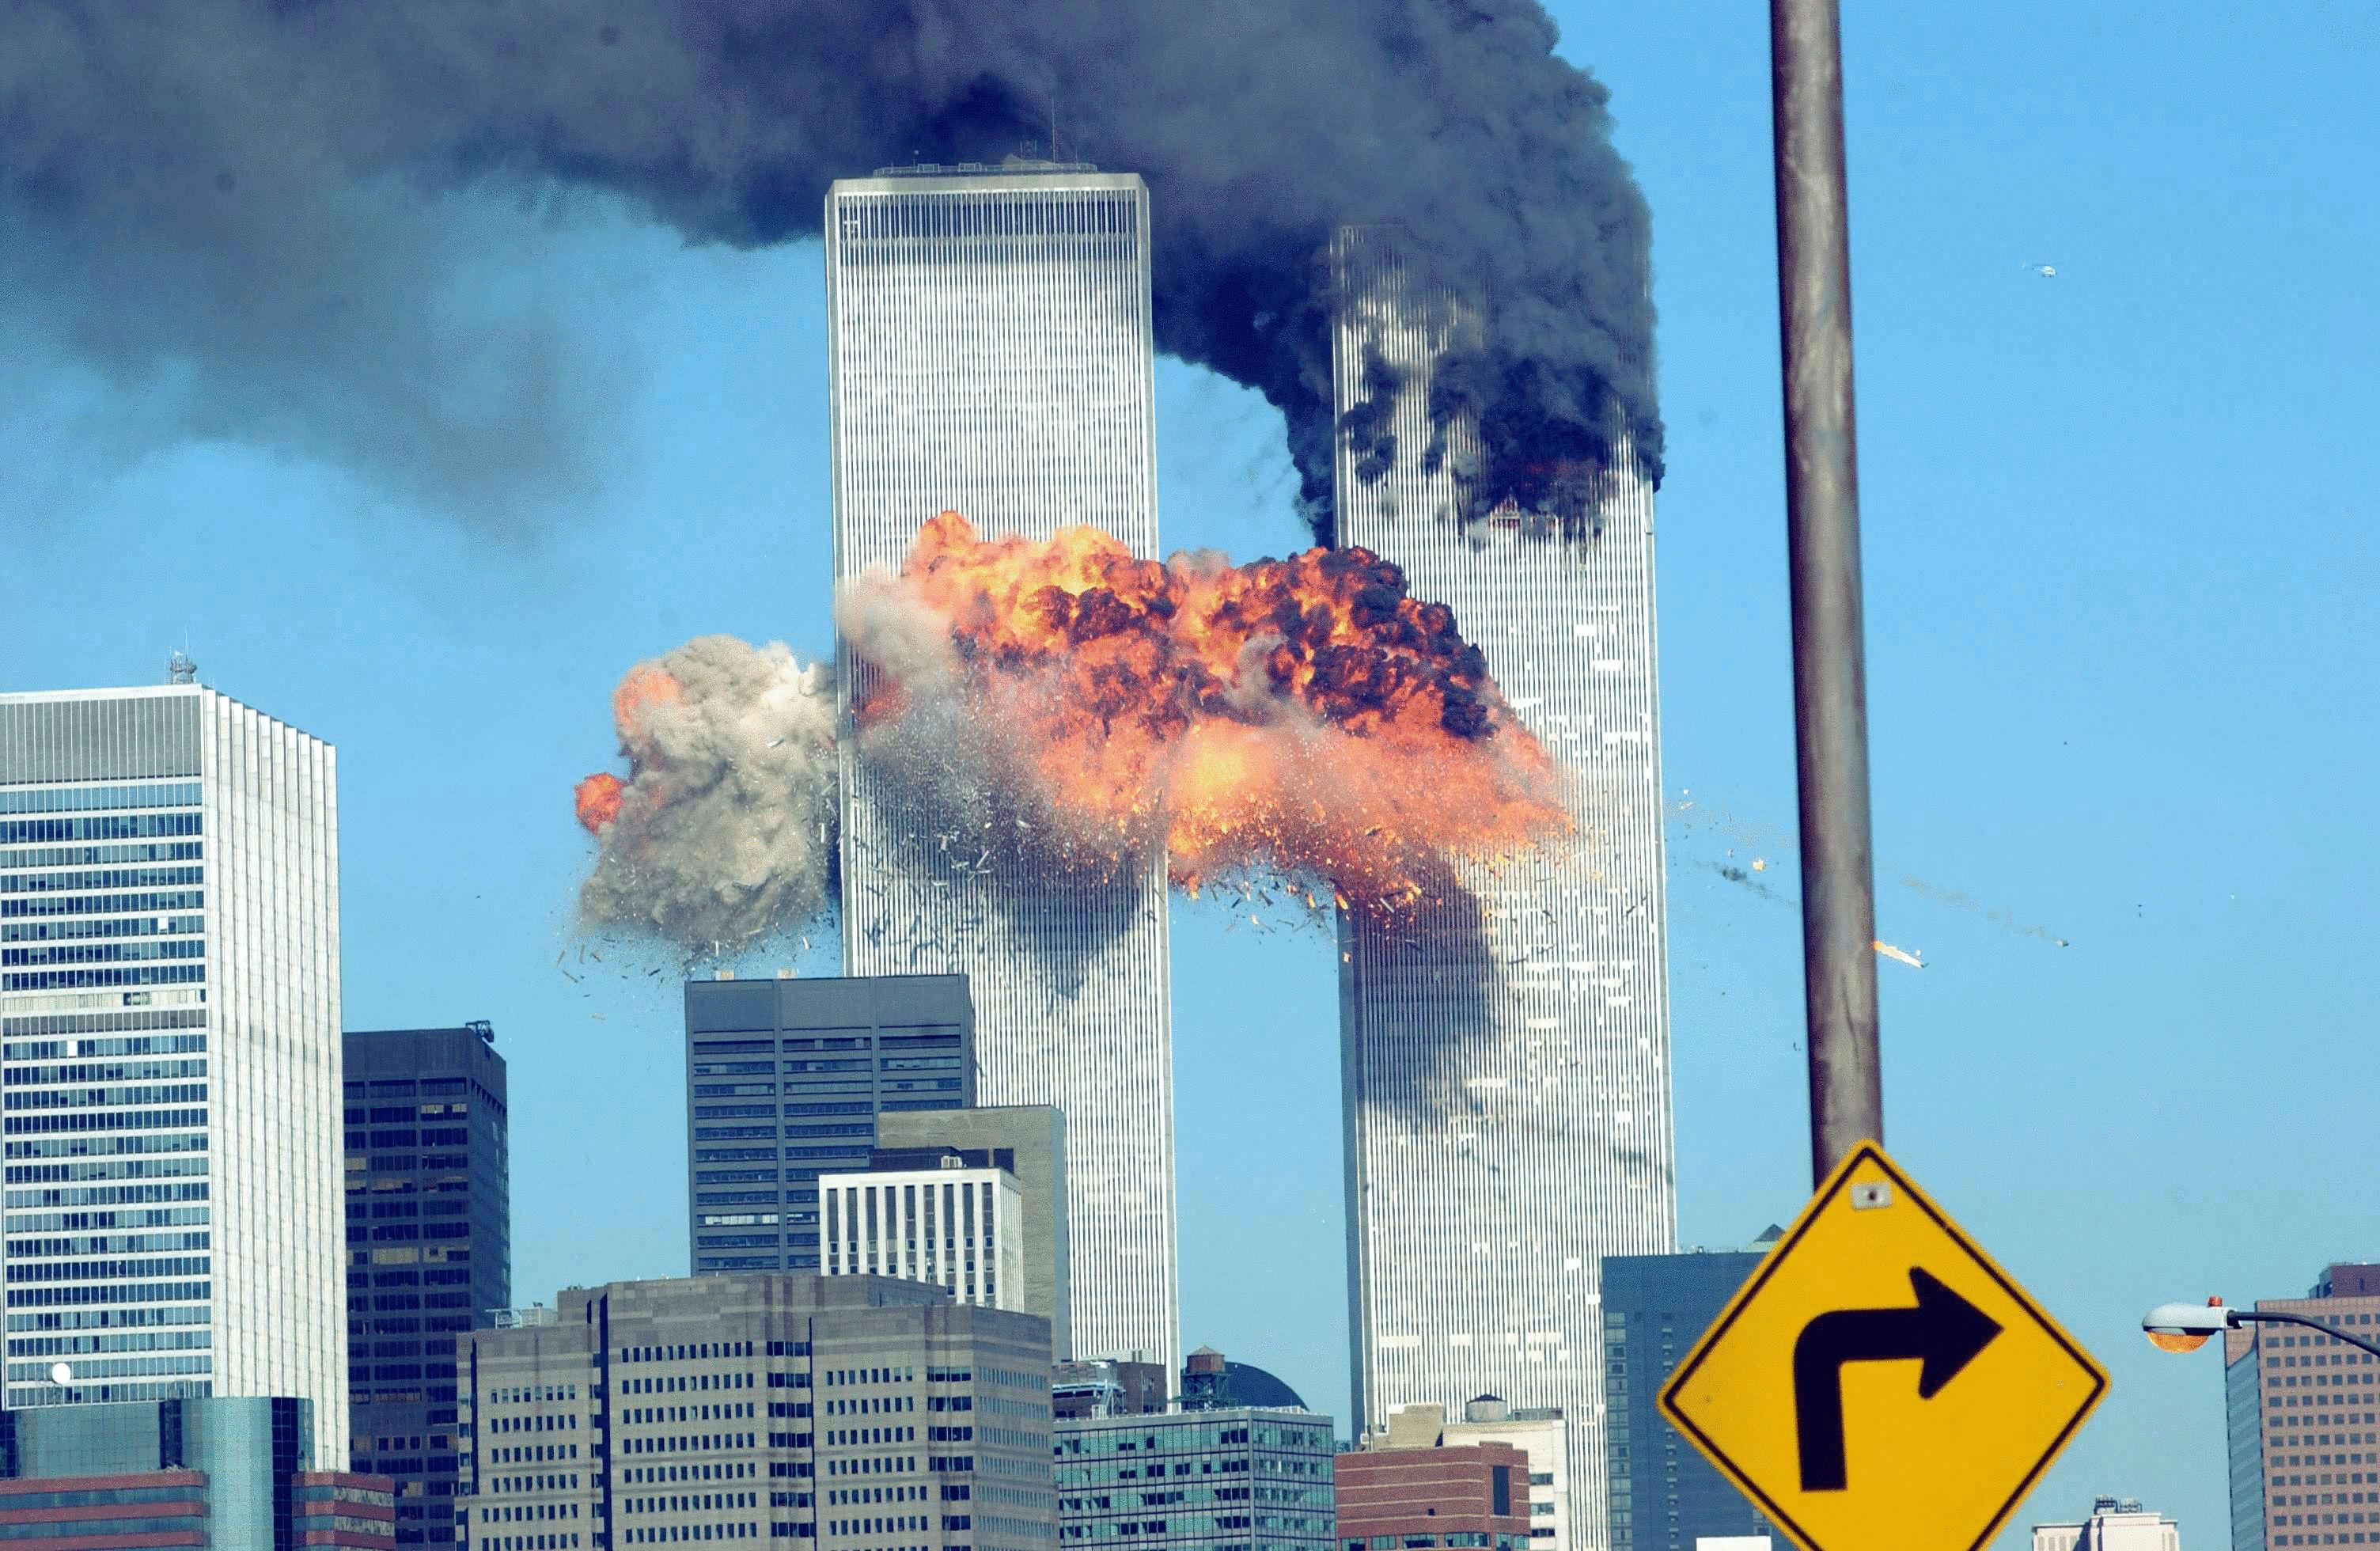 torres gemelas, ataque, terrorista, fotos